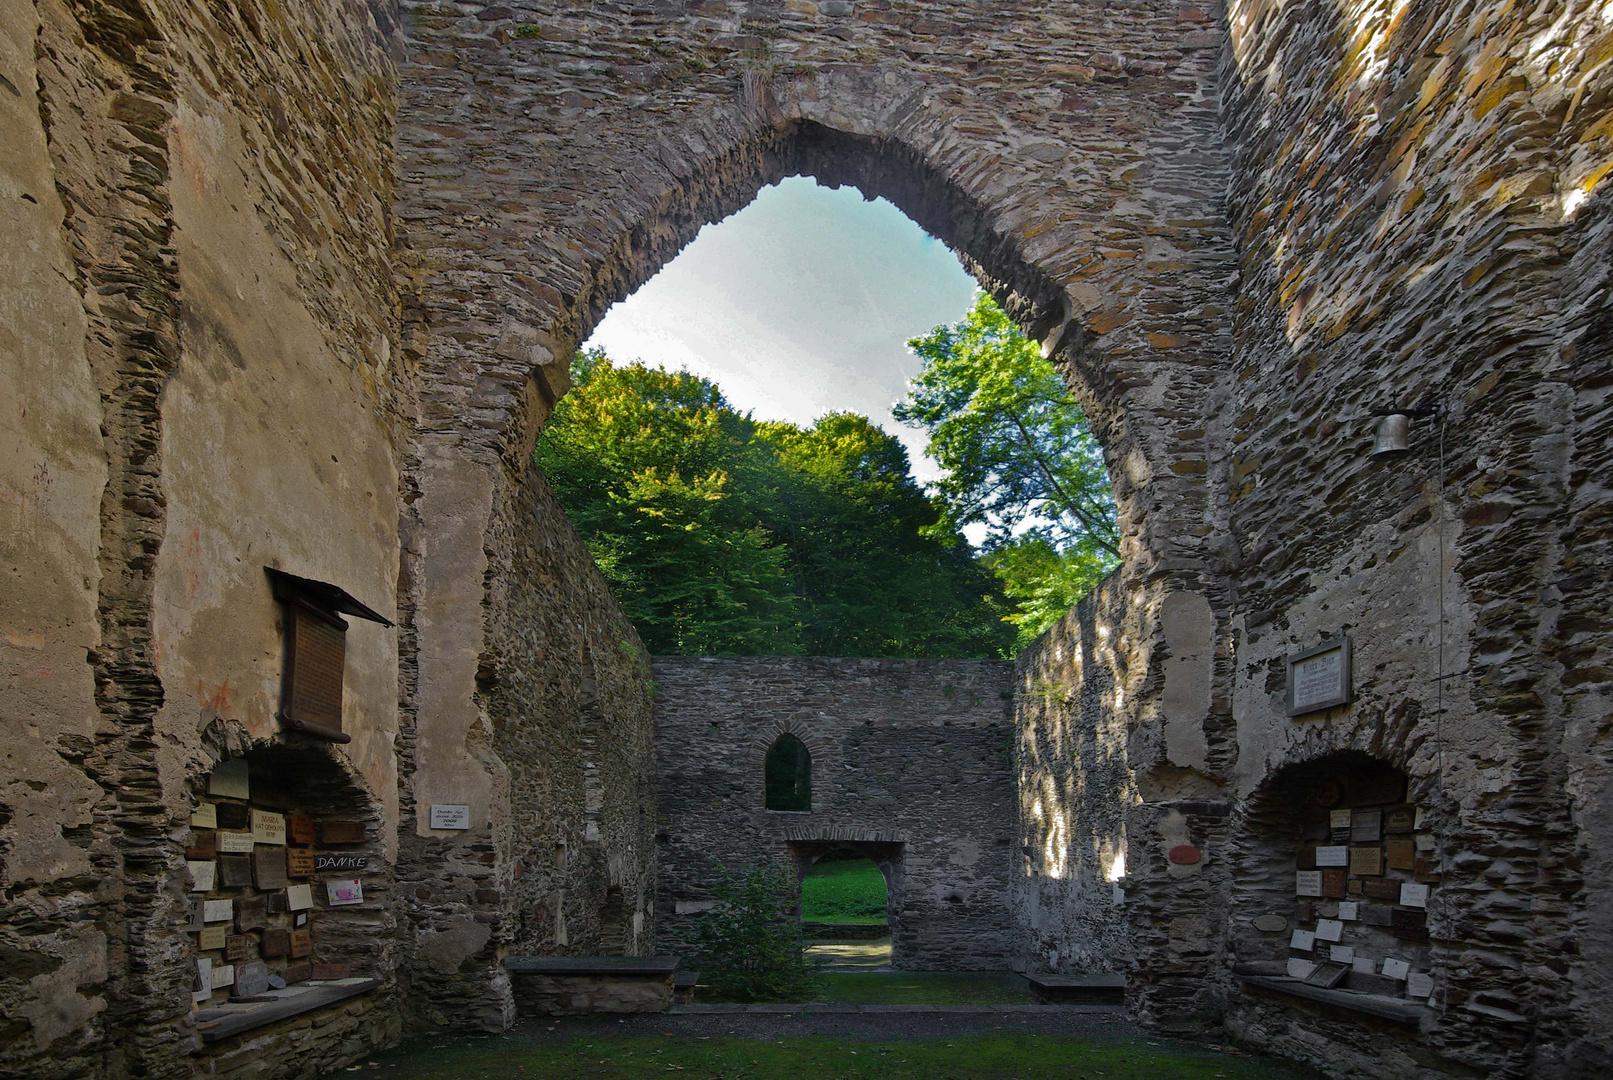 Kirchenruine Hausenborn (2) bei Isenburg / Saynbachtal / Westerwald